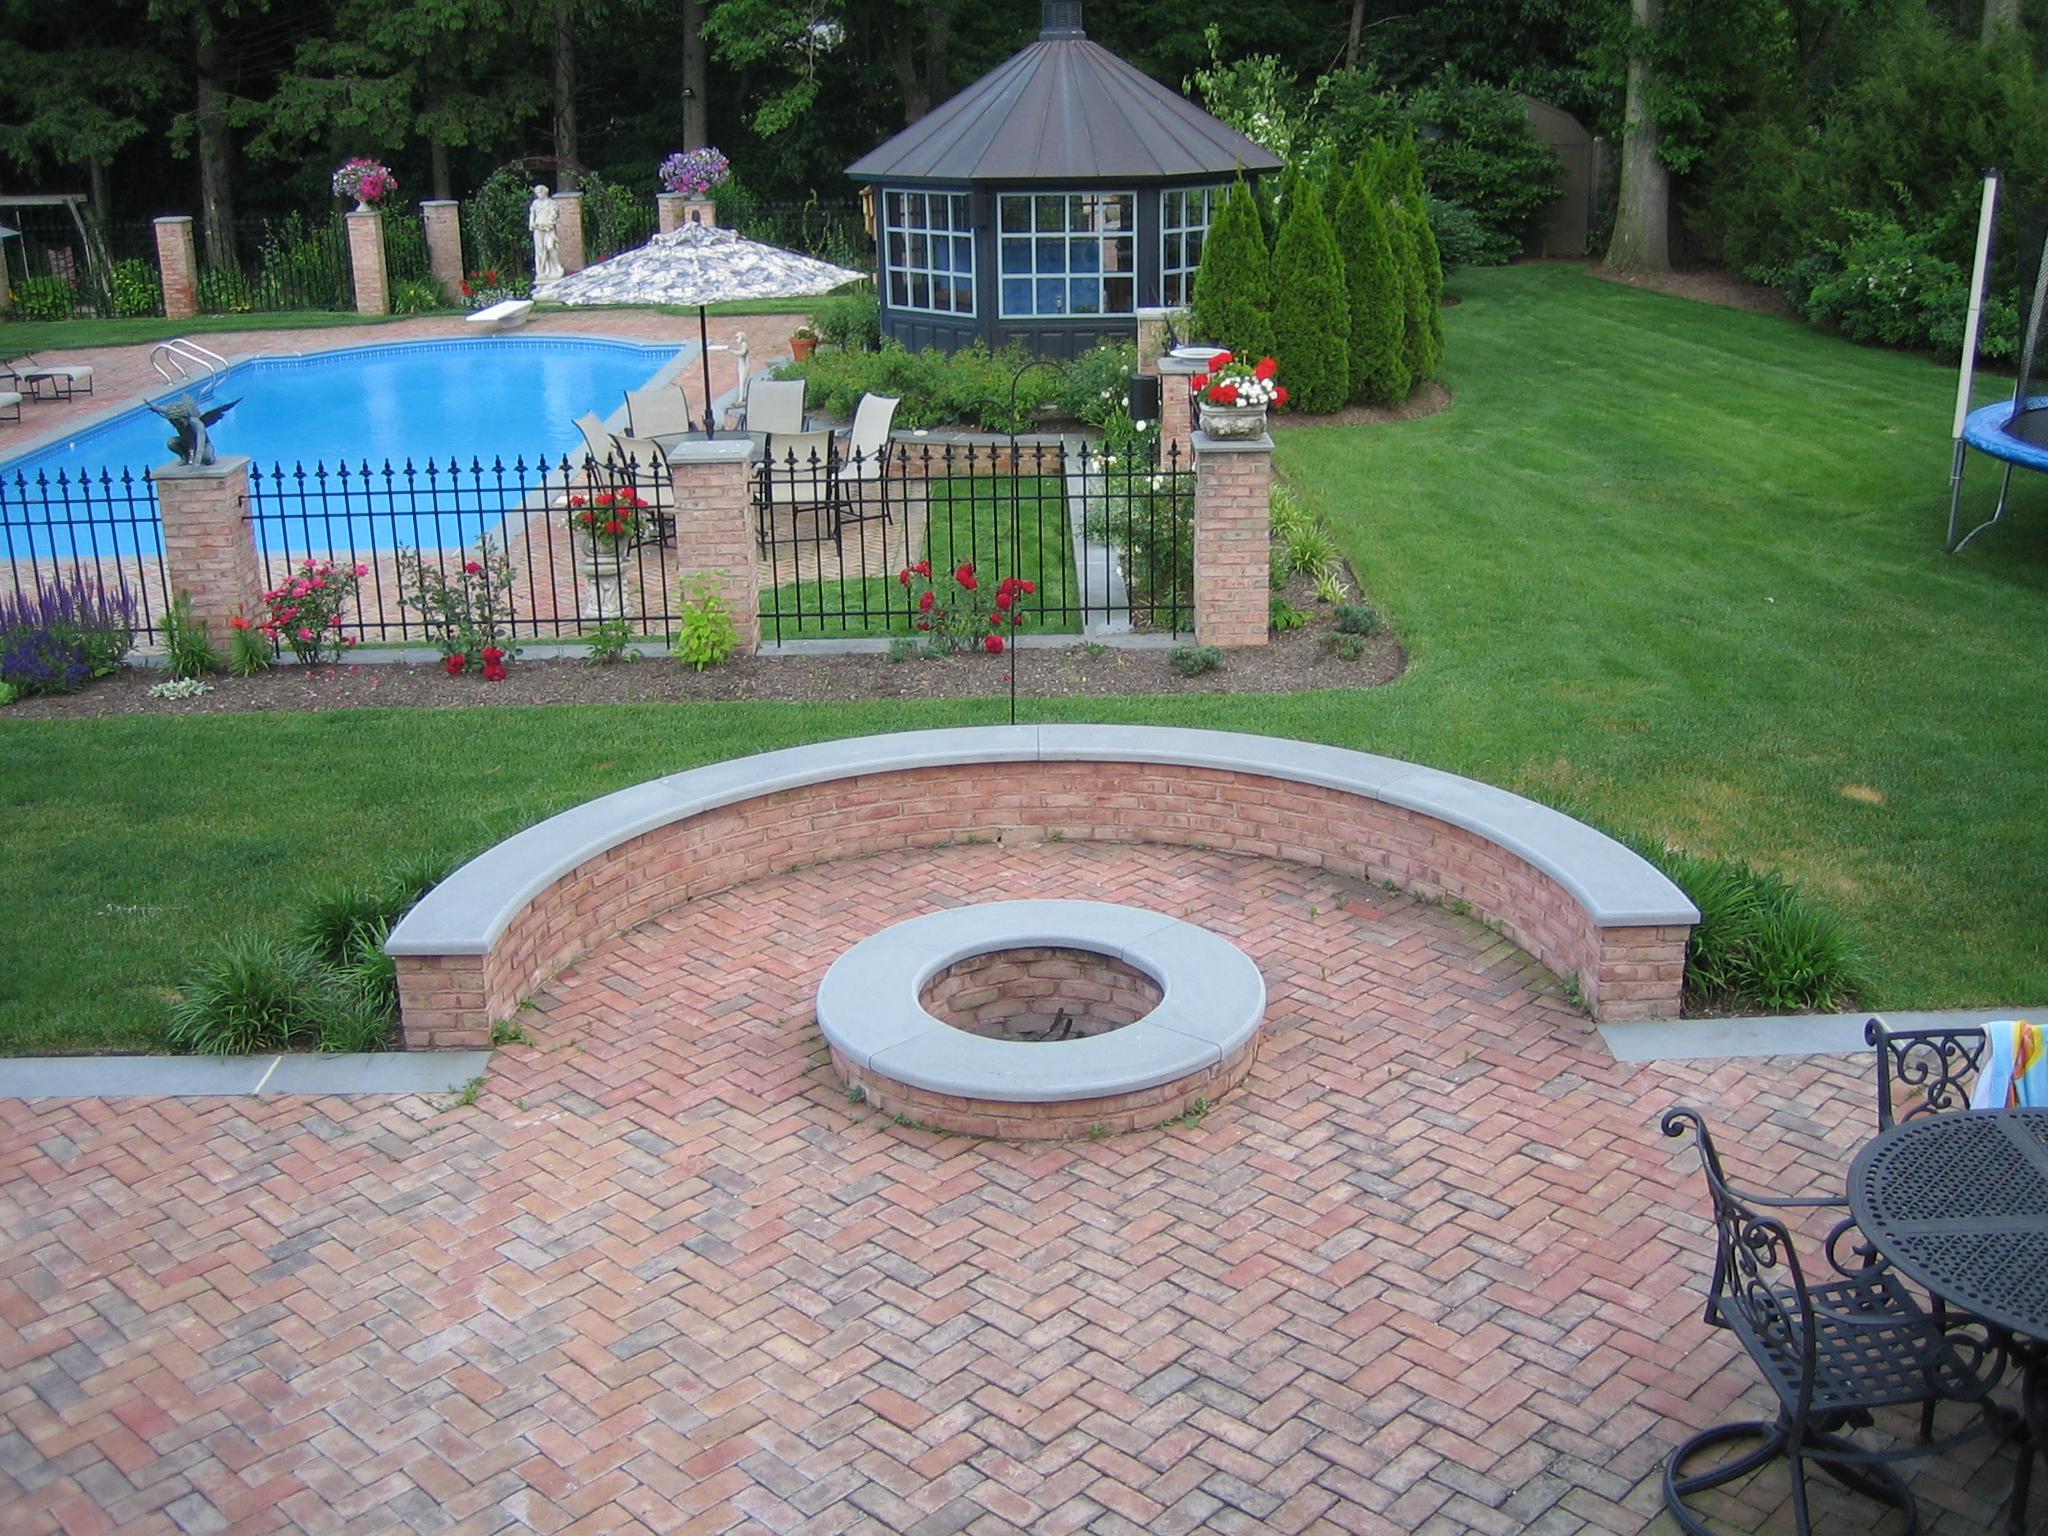 Professional unilock fire pit landscape design company in Long Island, NY